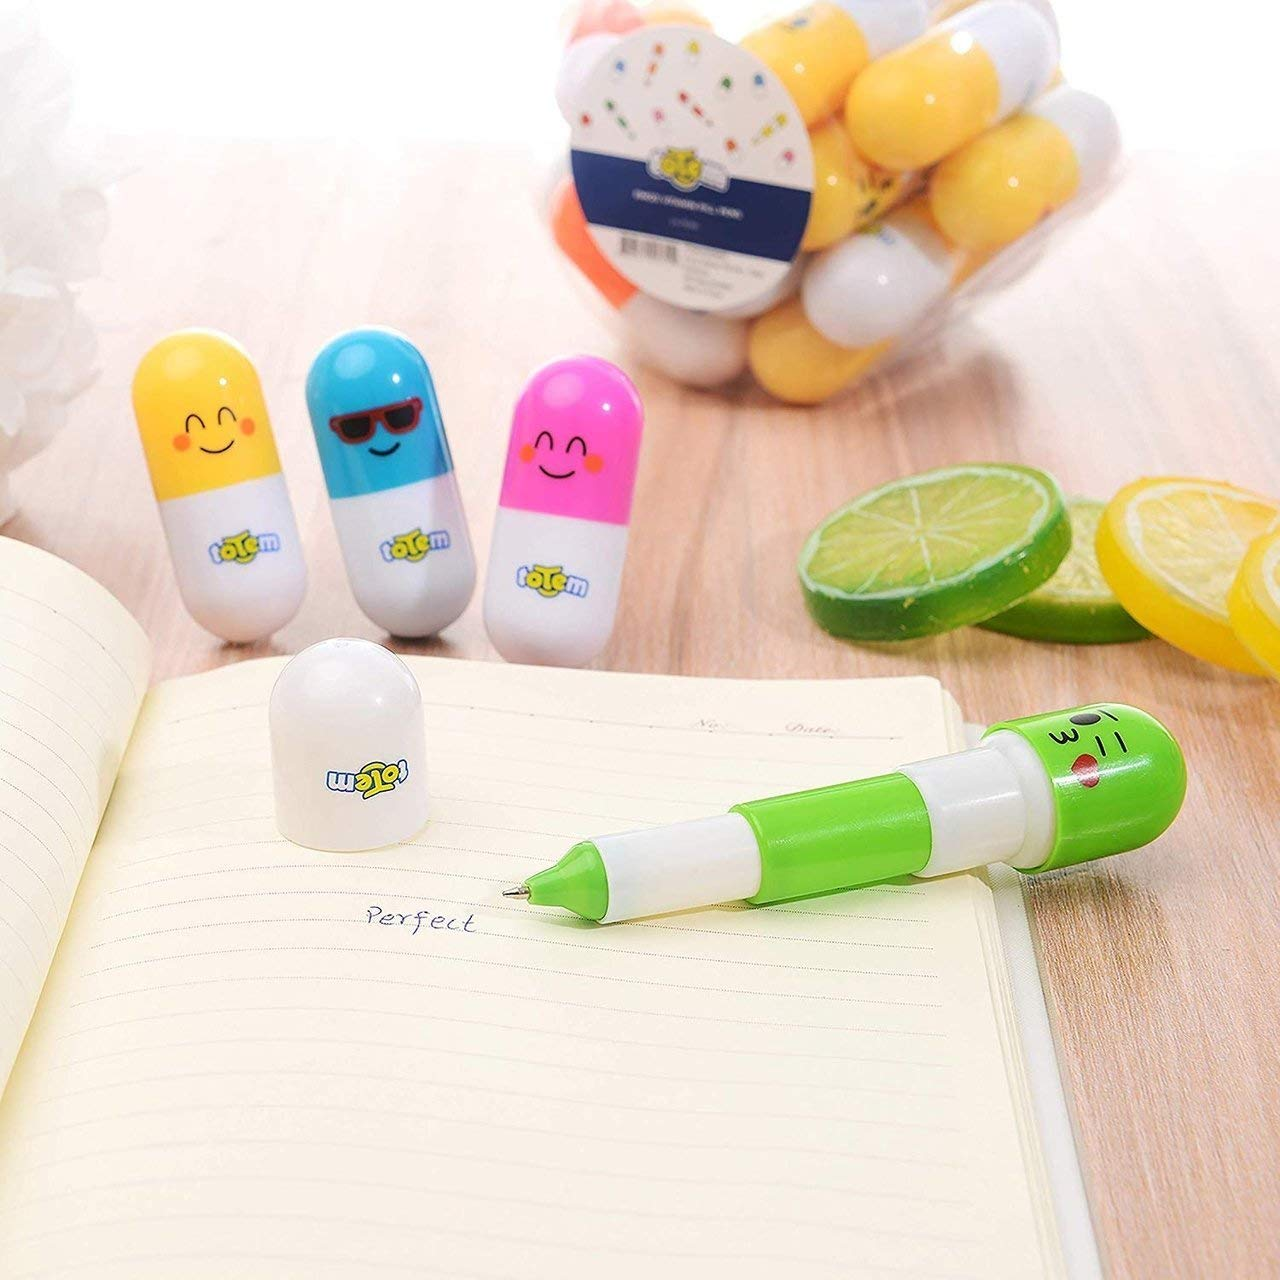 Totem World 48 Emoji Vitamin Pill Retractable Ballpoint Capsule Pen with Cute Yellow Emoticon Faces